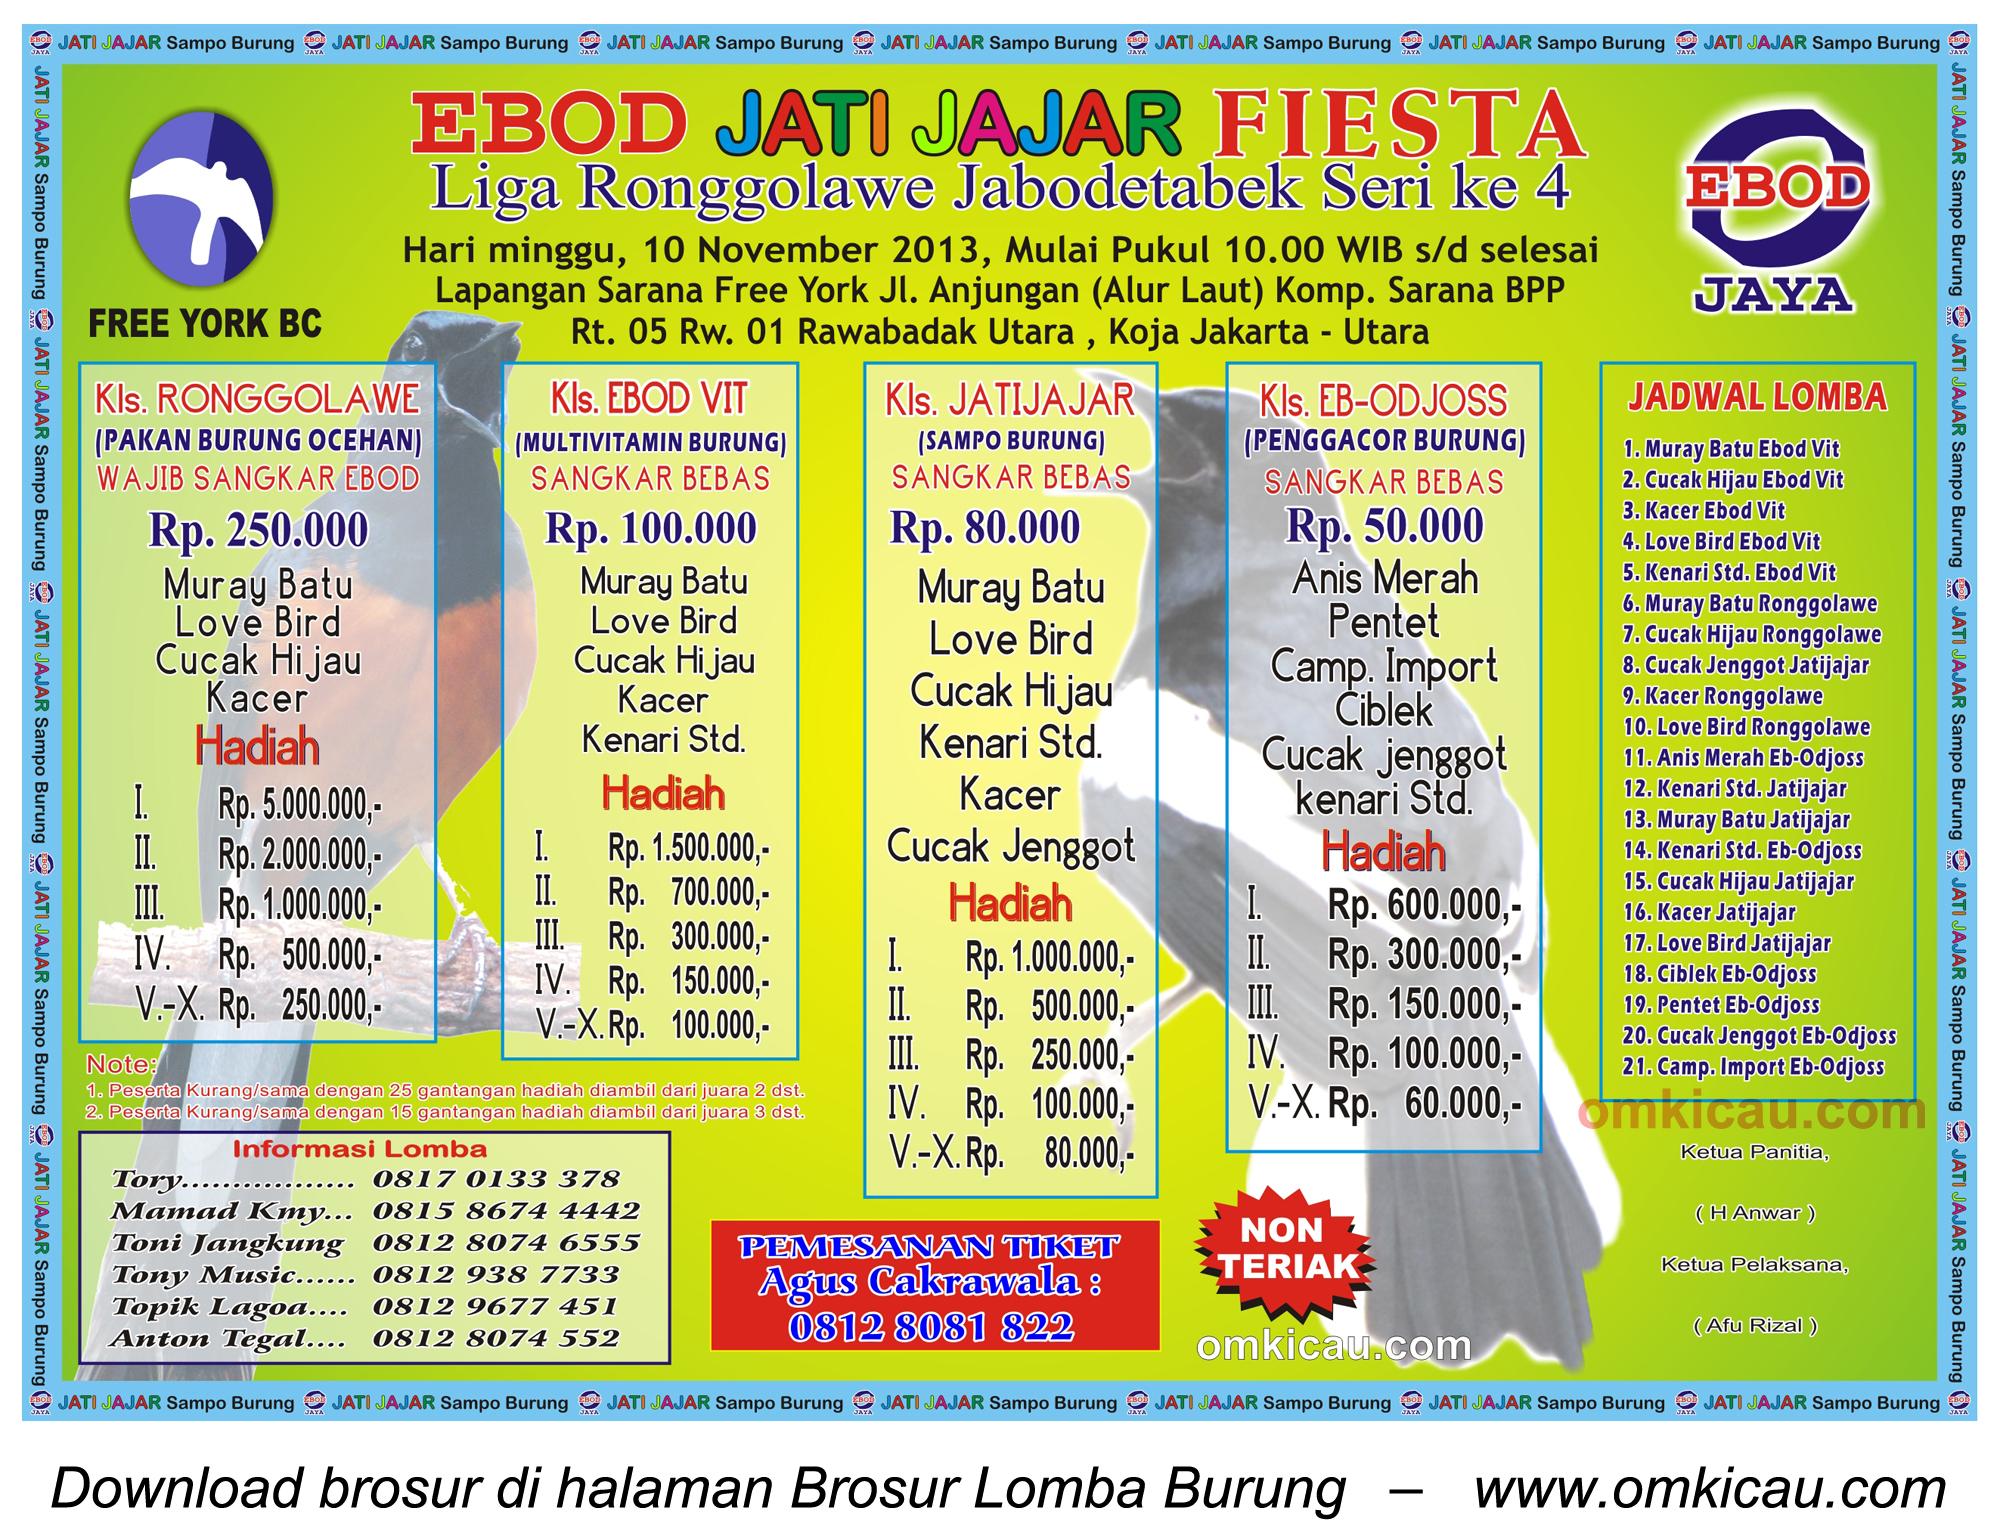 Brosur Lomba Burung Ebod Jatijajar Fiesta (LR Jabodetabek 4). Jakarta, 10 November 2013